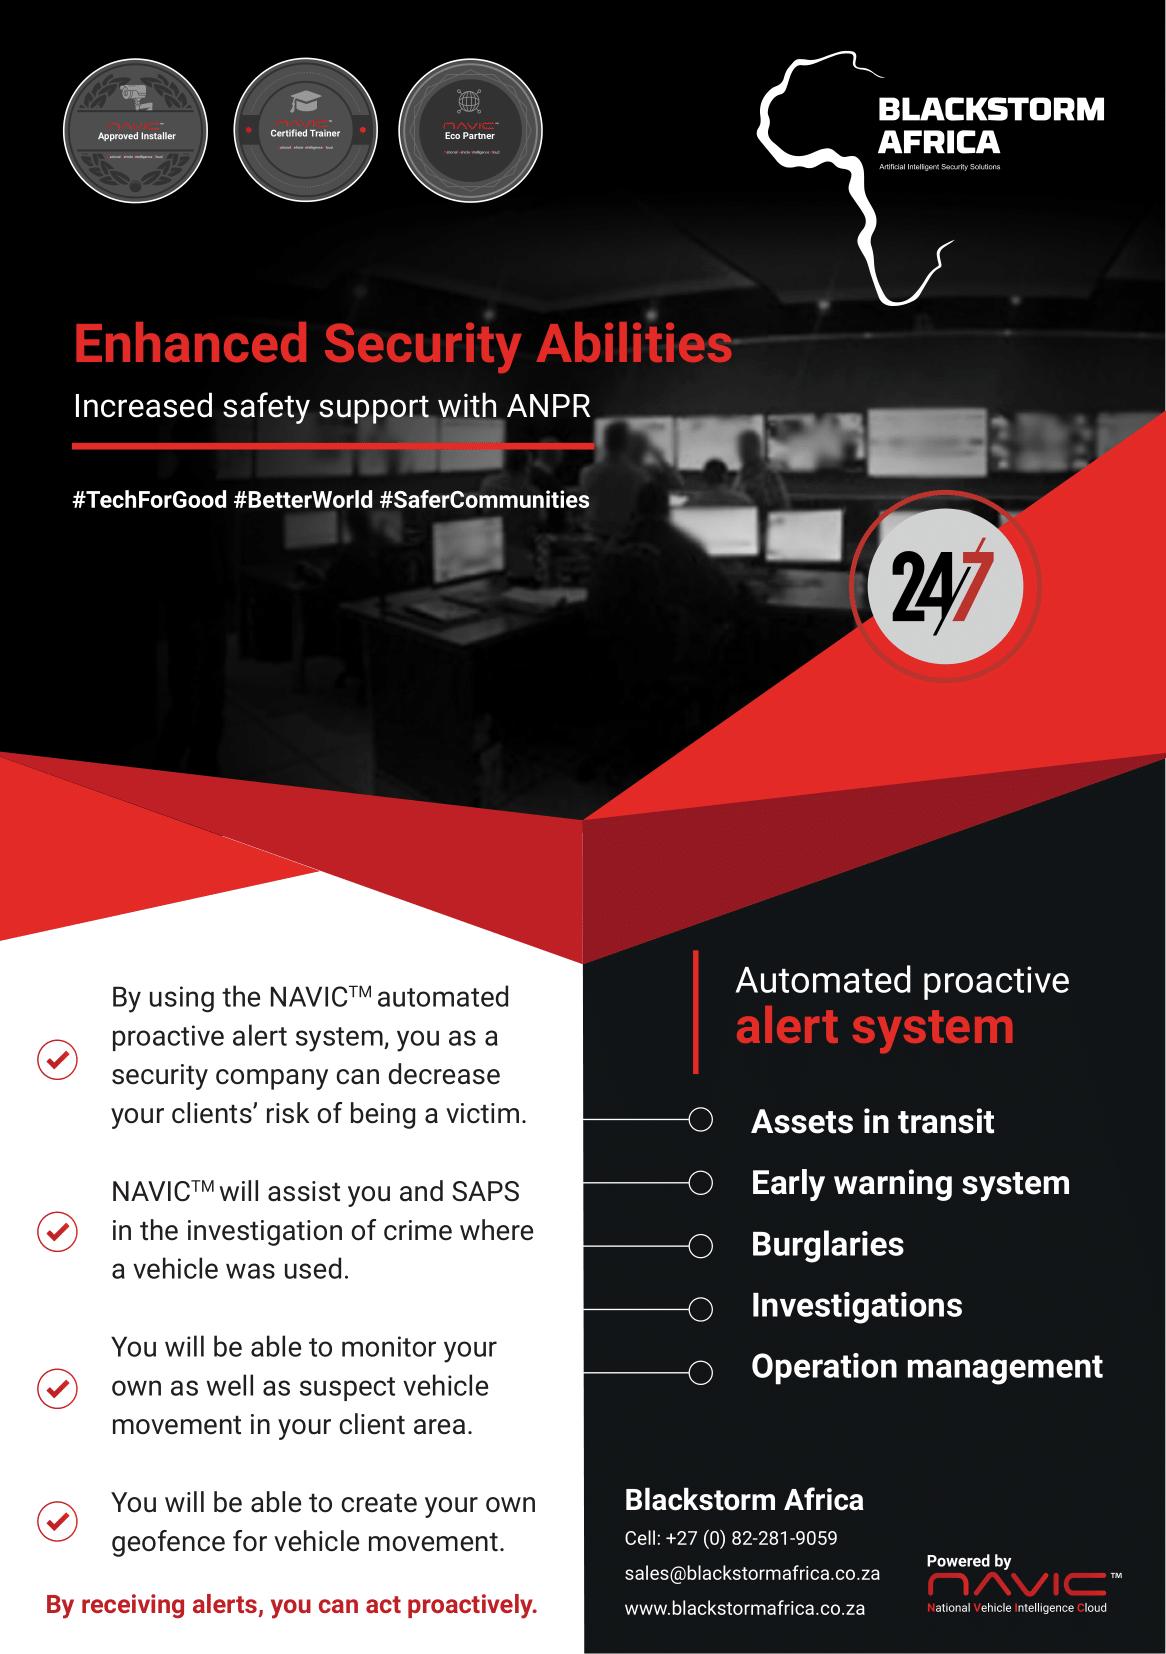 Blackstorm - enhance security abilities-1